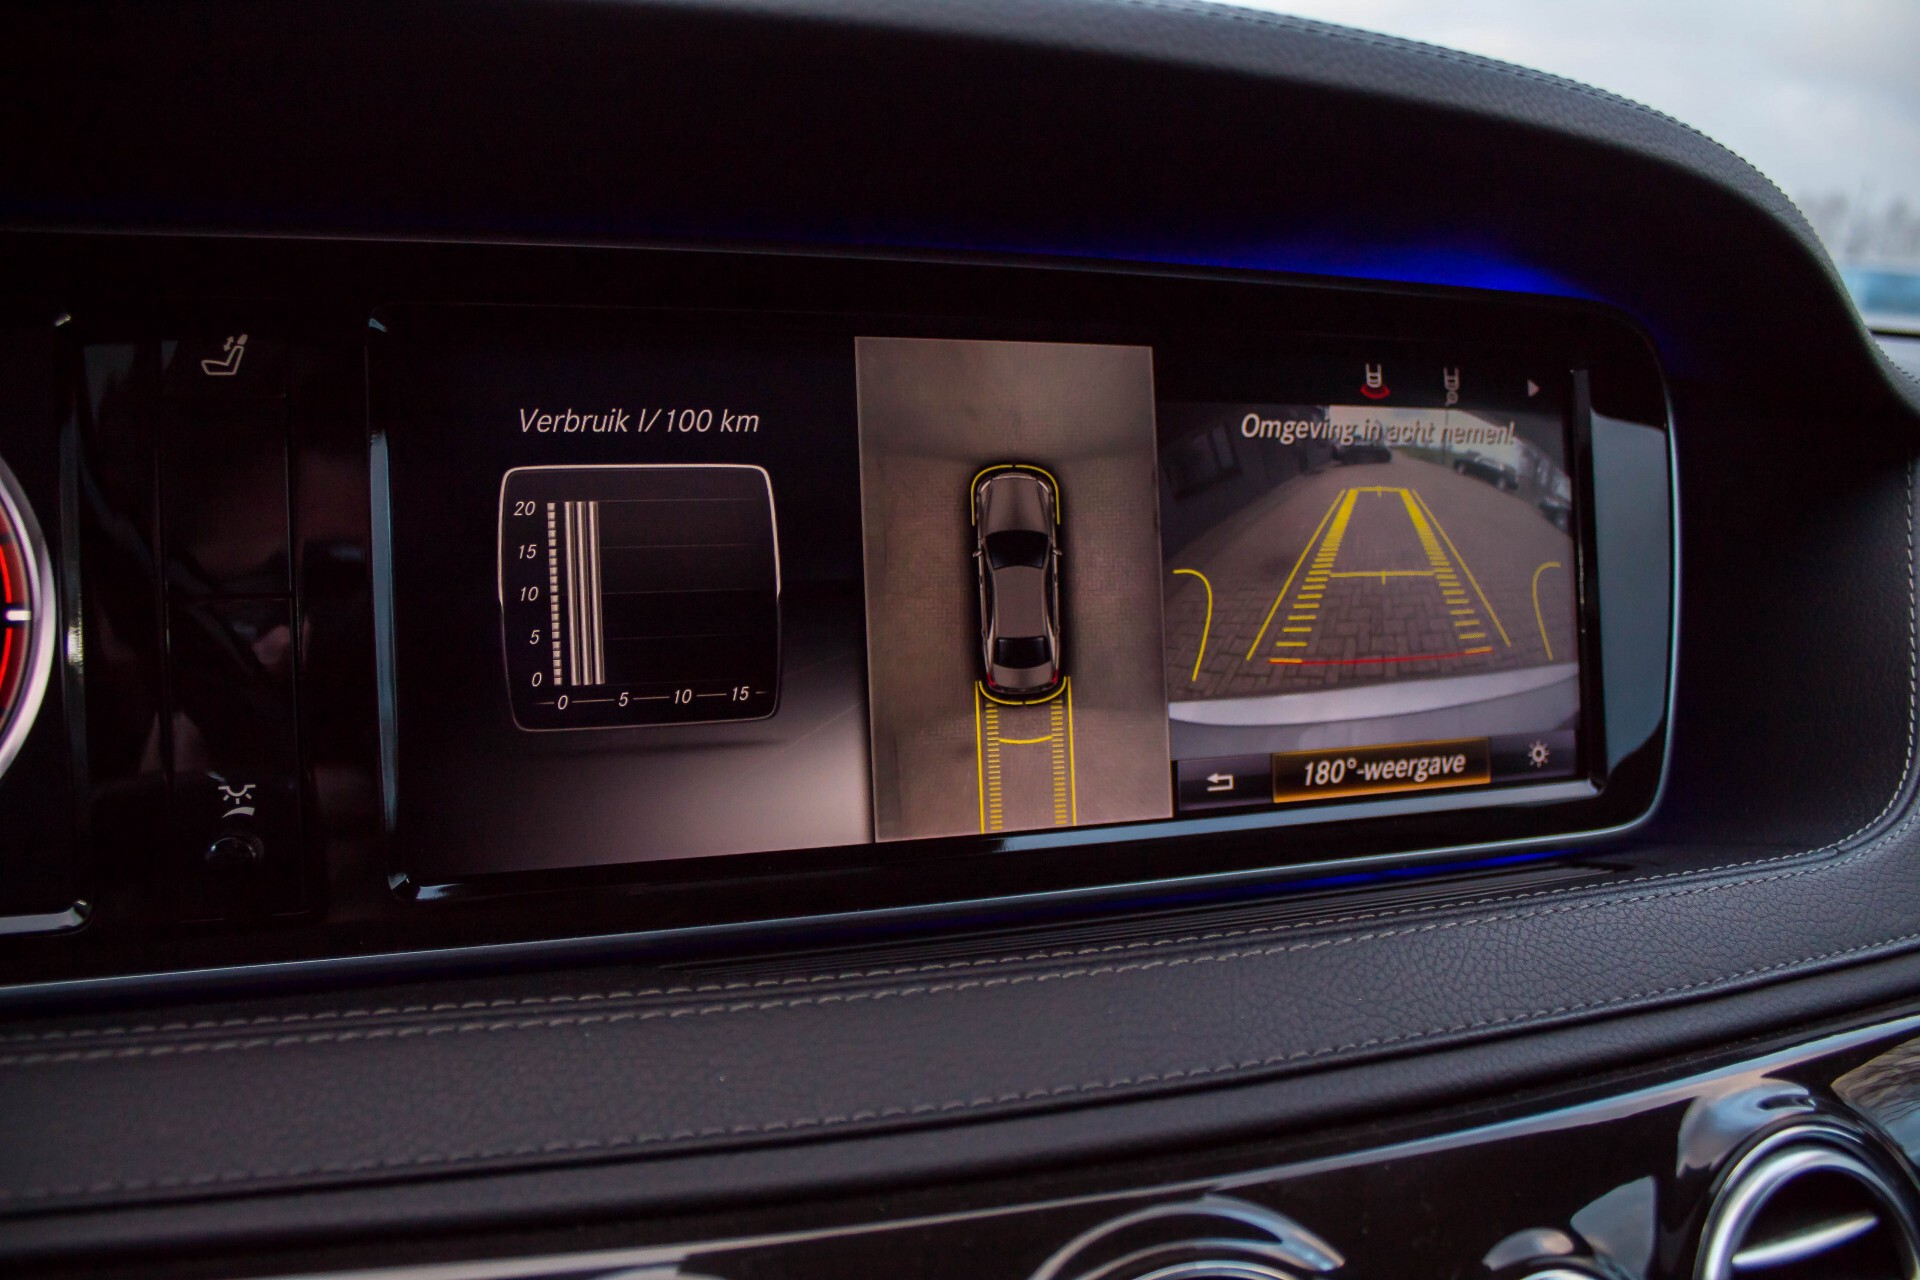 Mercedes-Benz S-Klasse 350 BlueTEC 63 AMG Panorama/Distronic/Keyless/Massage/Burmester Aut7 Foto 10